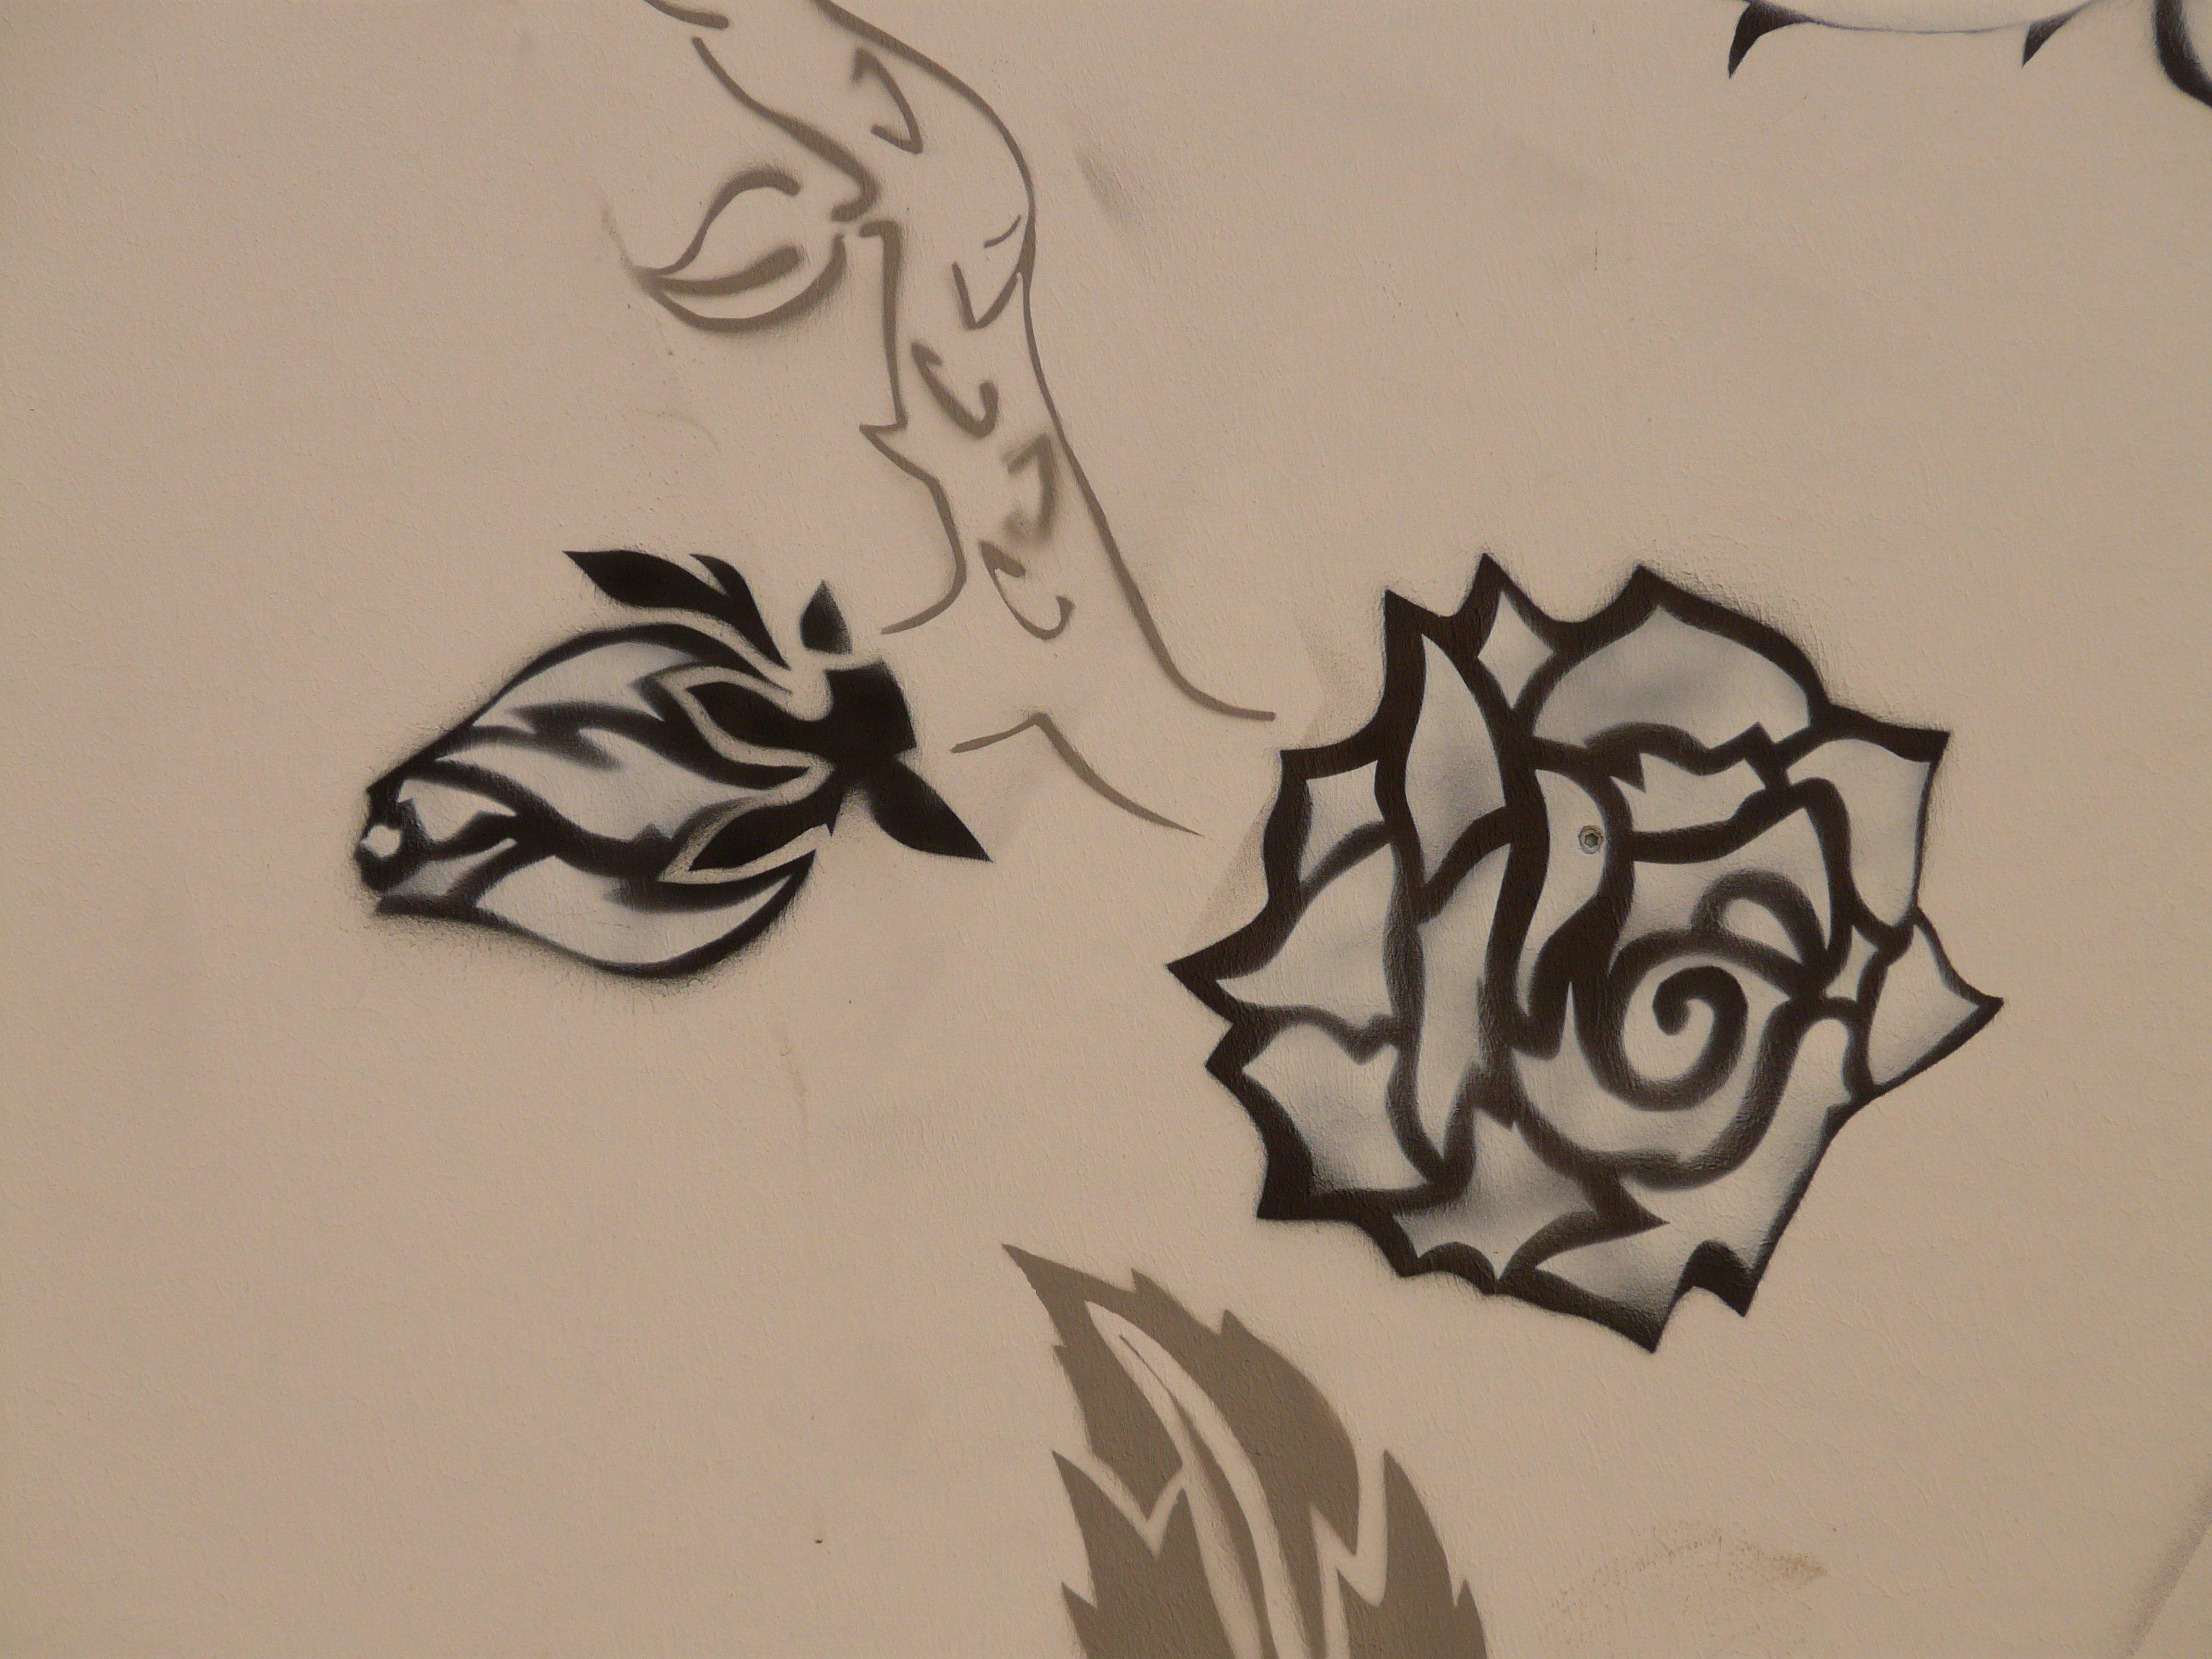 Gambar Hewan Mawar Cat Coretan Karya Seni Lukisan Fon